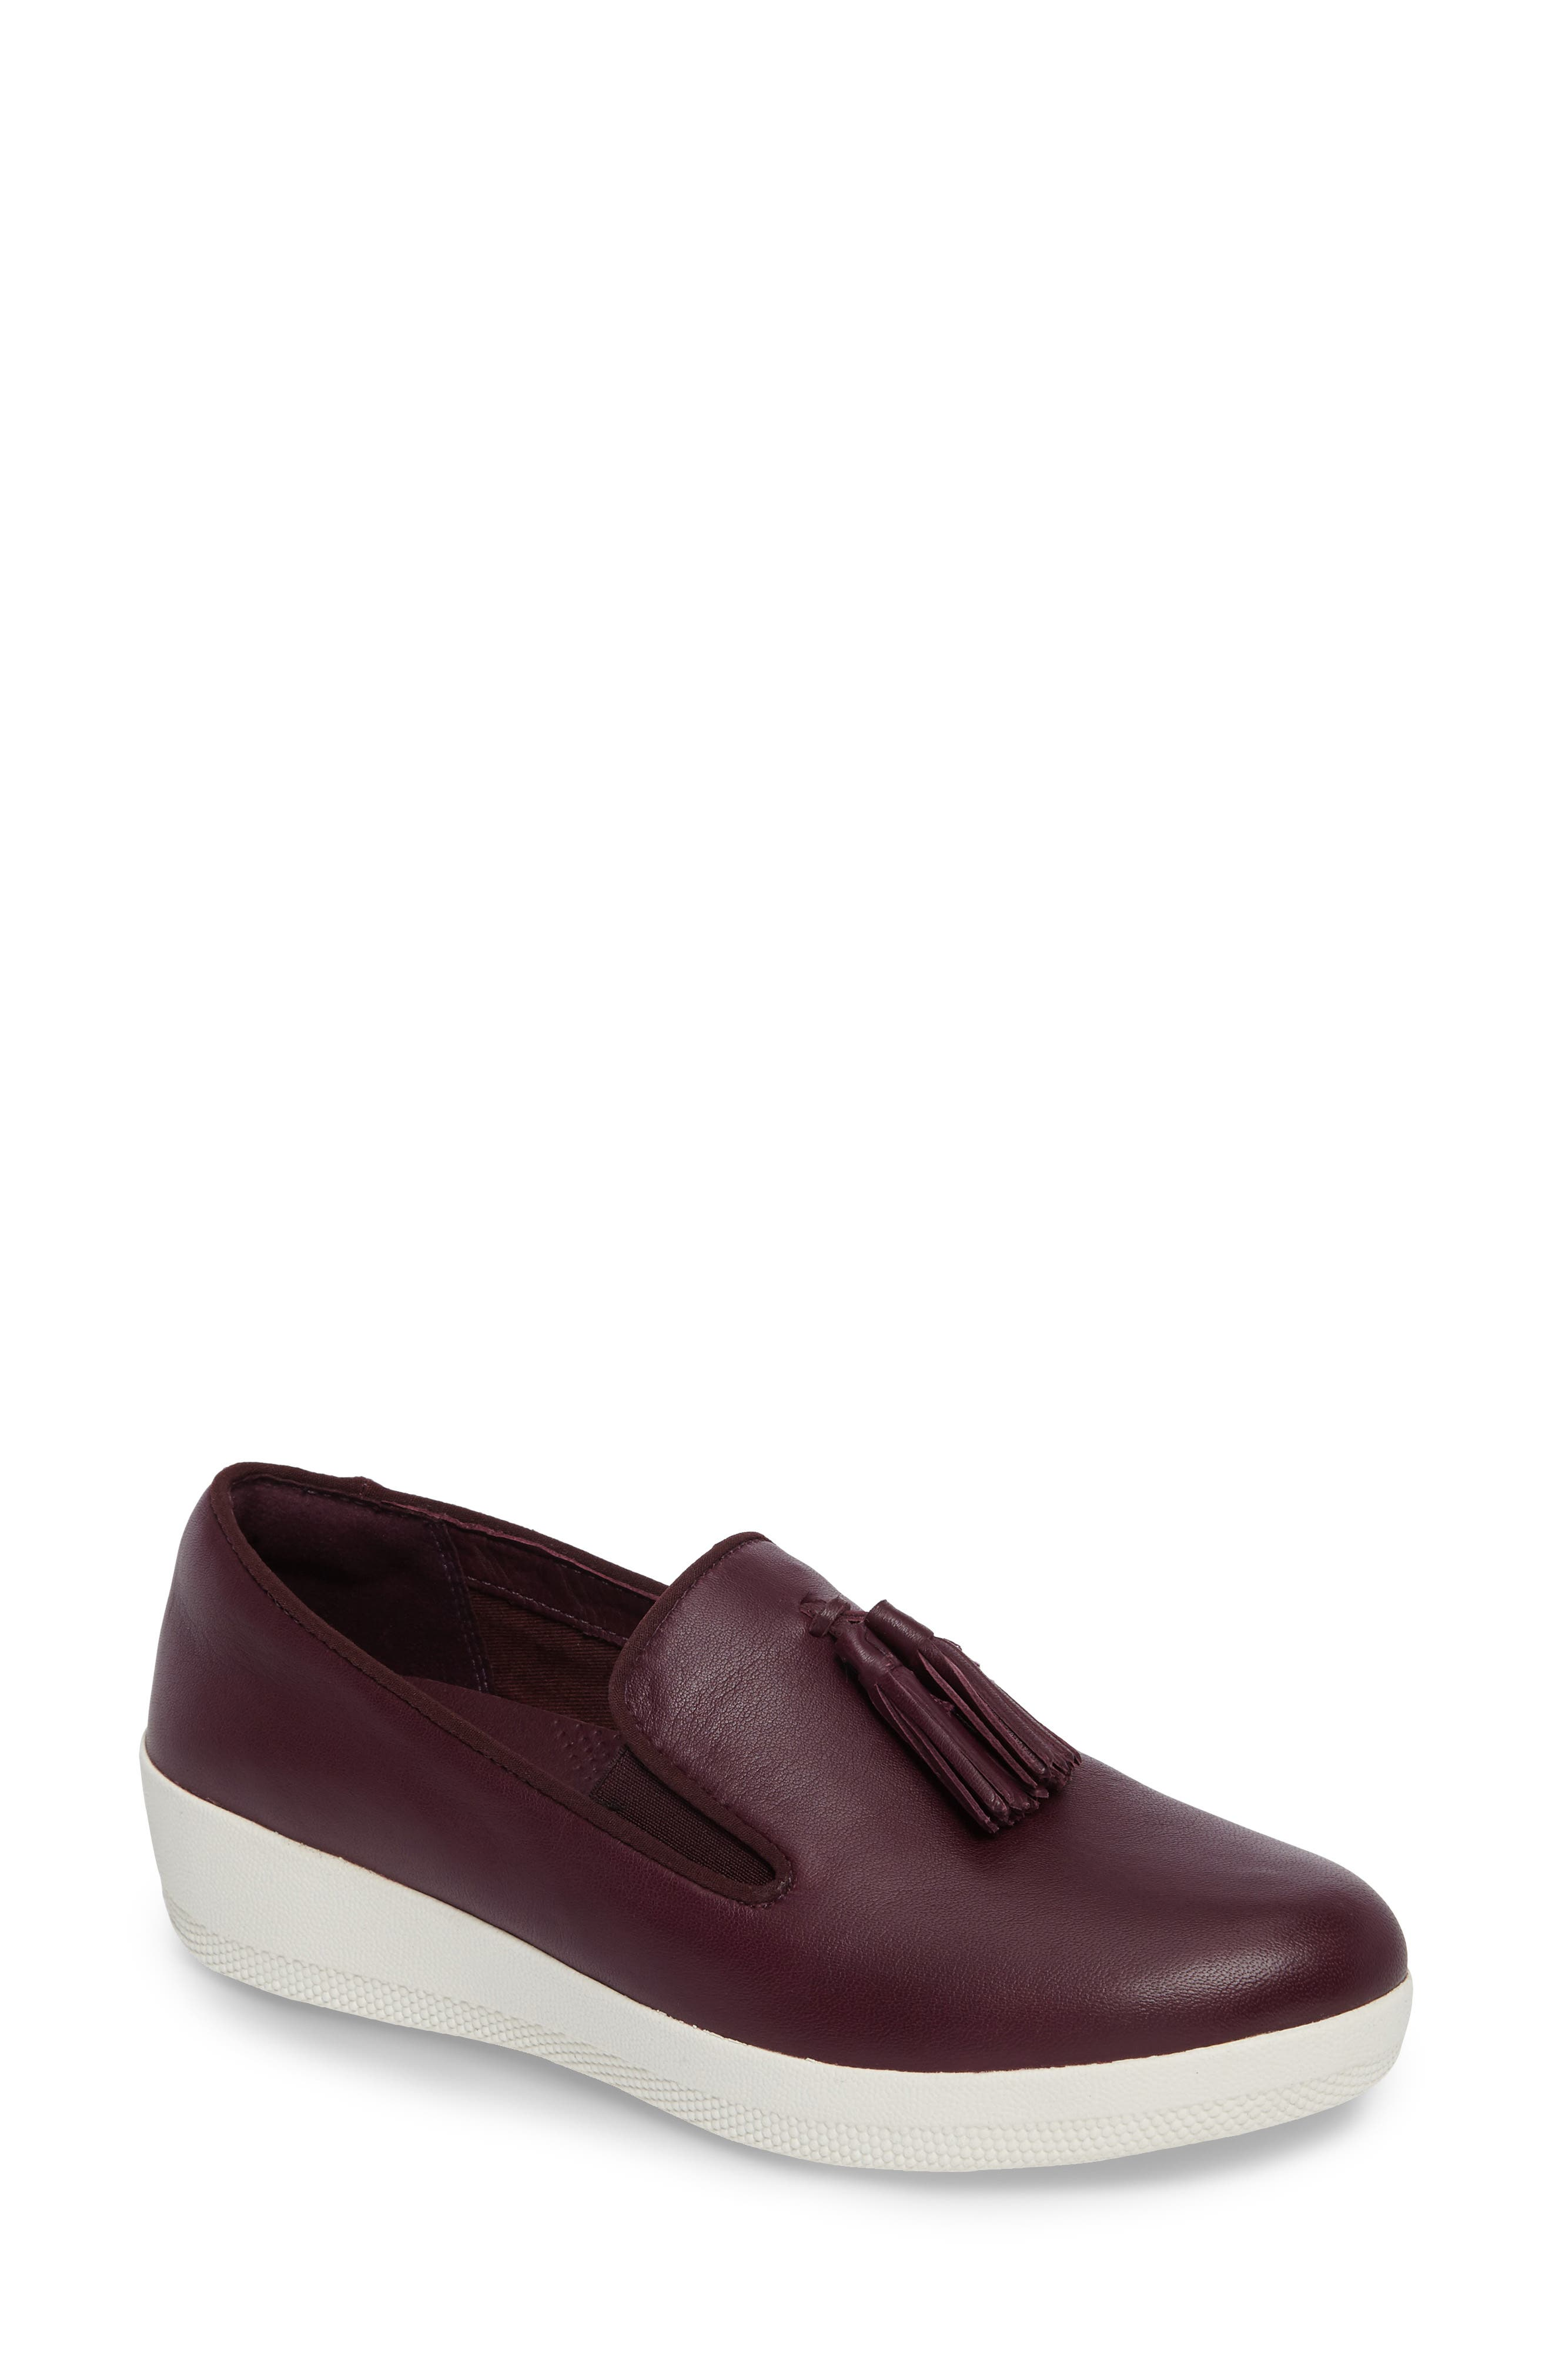 Tassle Superskate Wedge Sneaker,                             Main thumbnail 3, color,